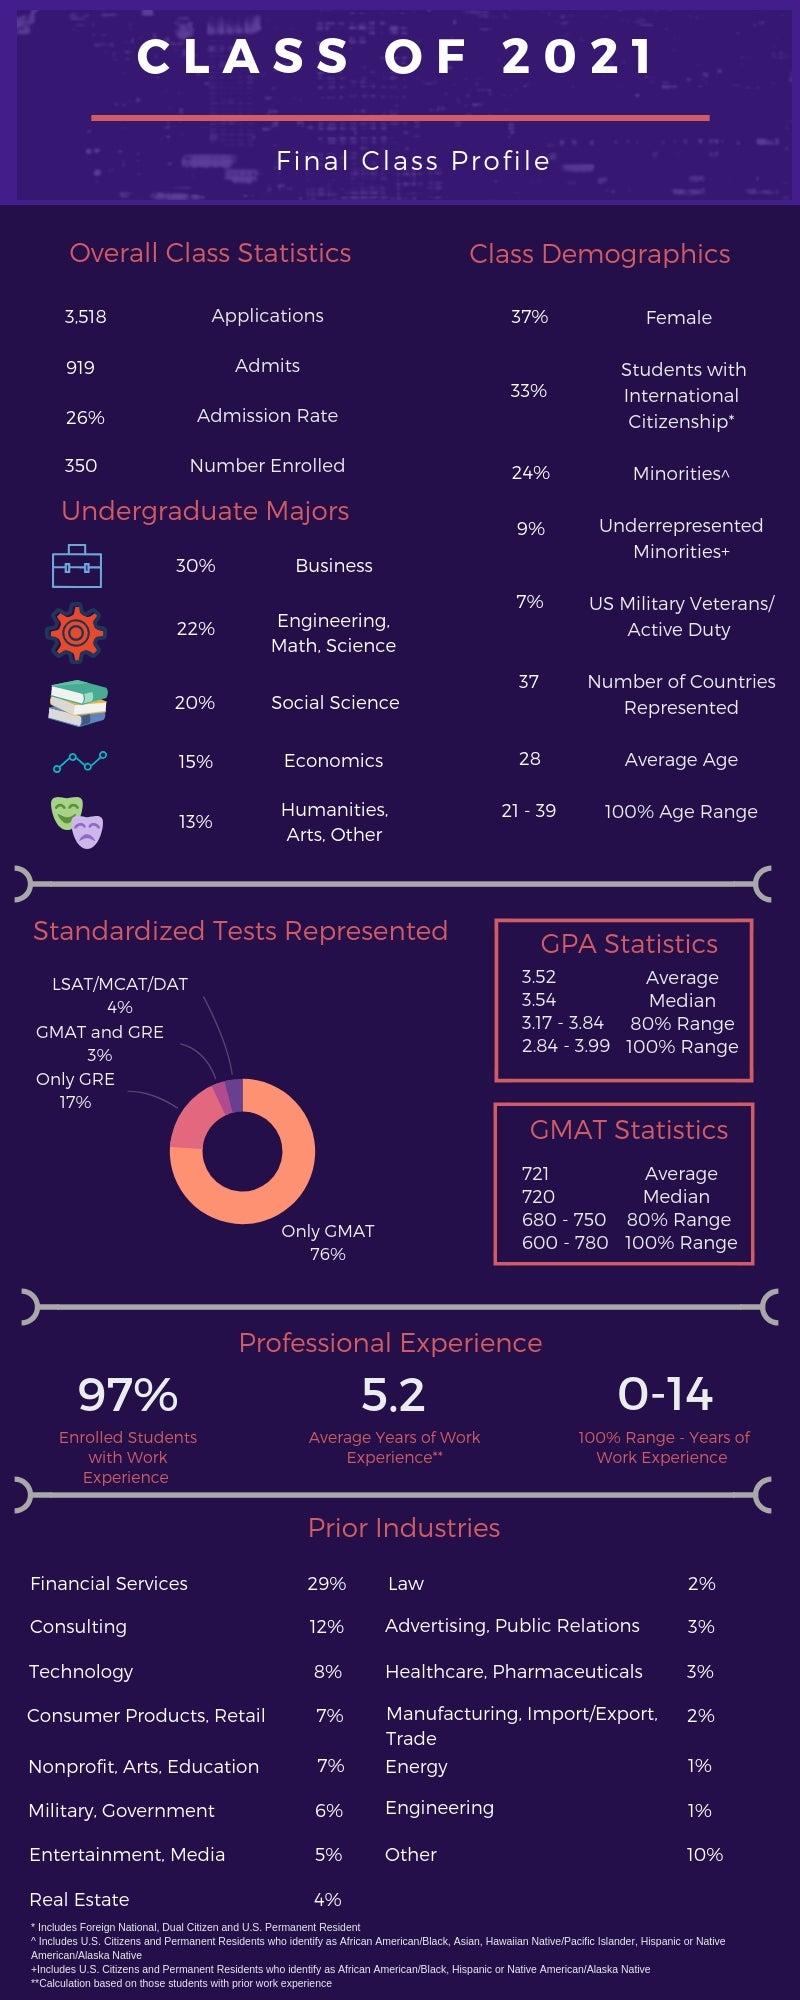 FT final class profile